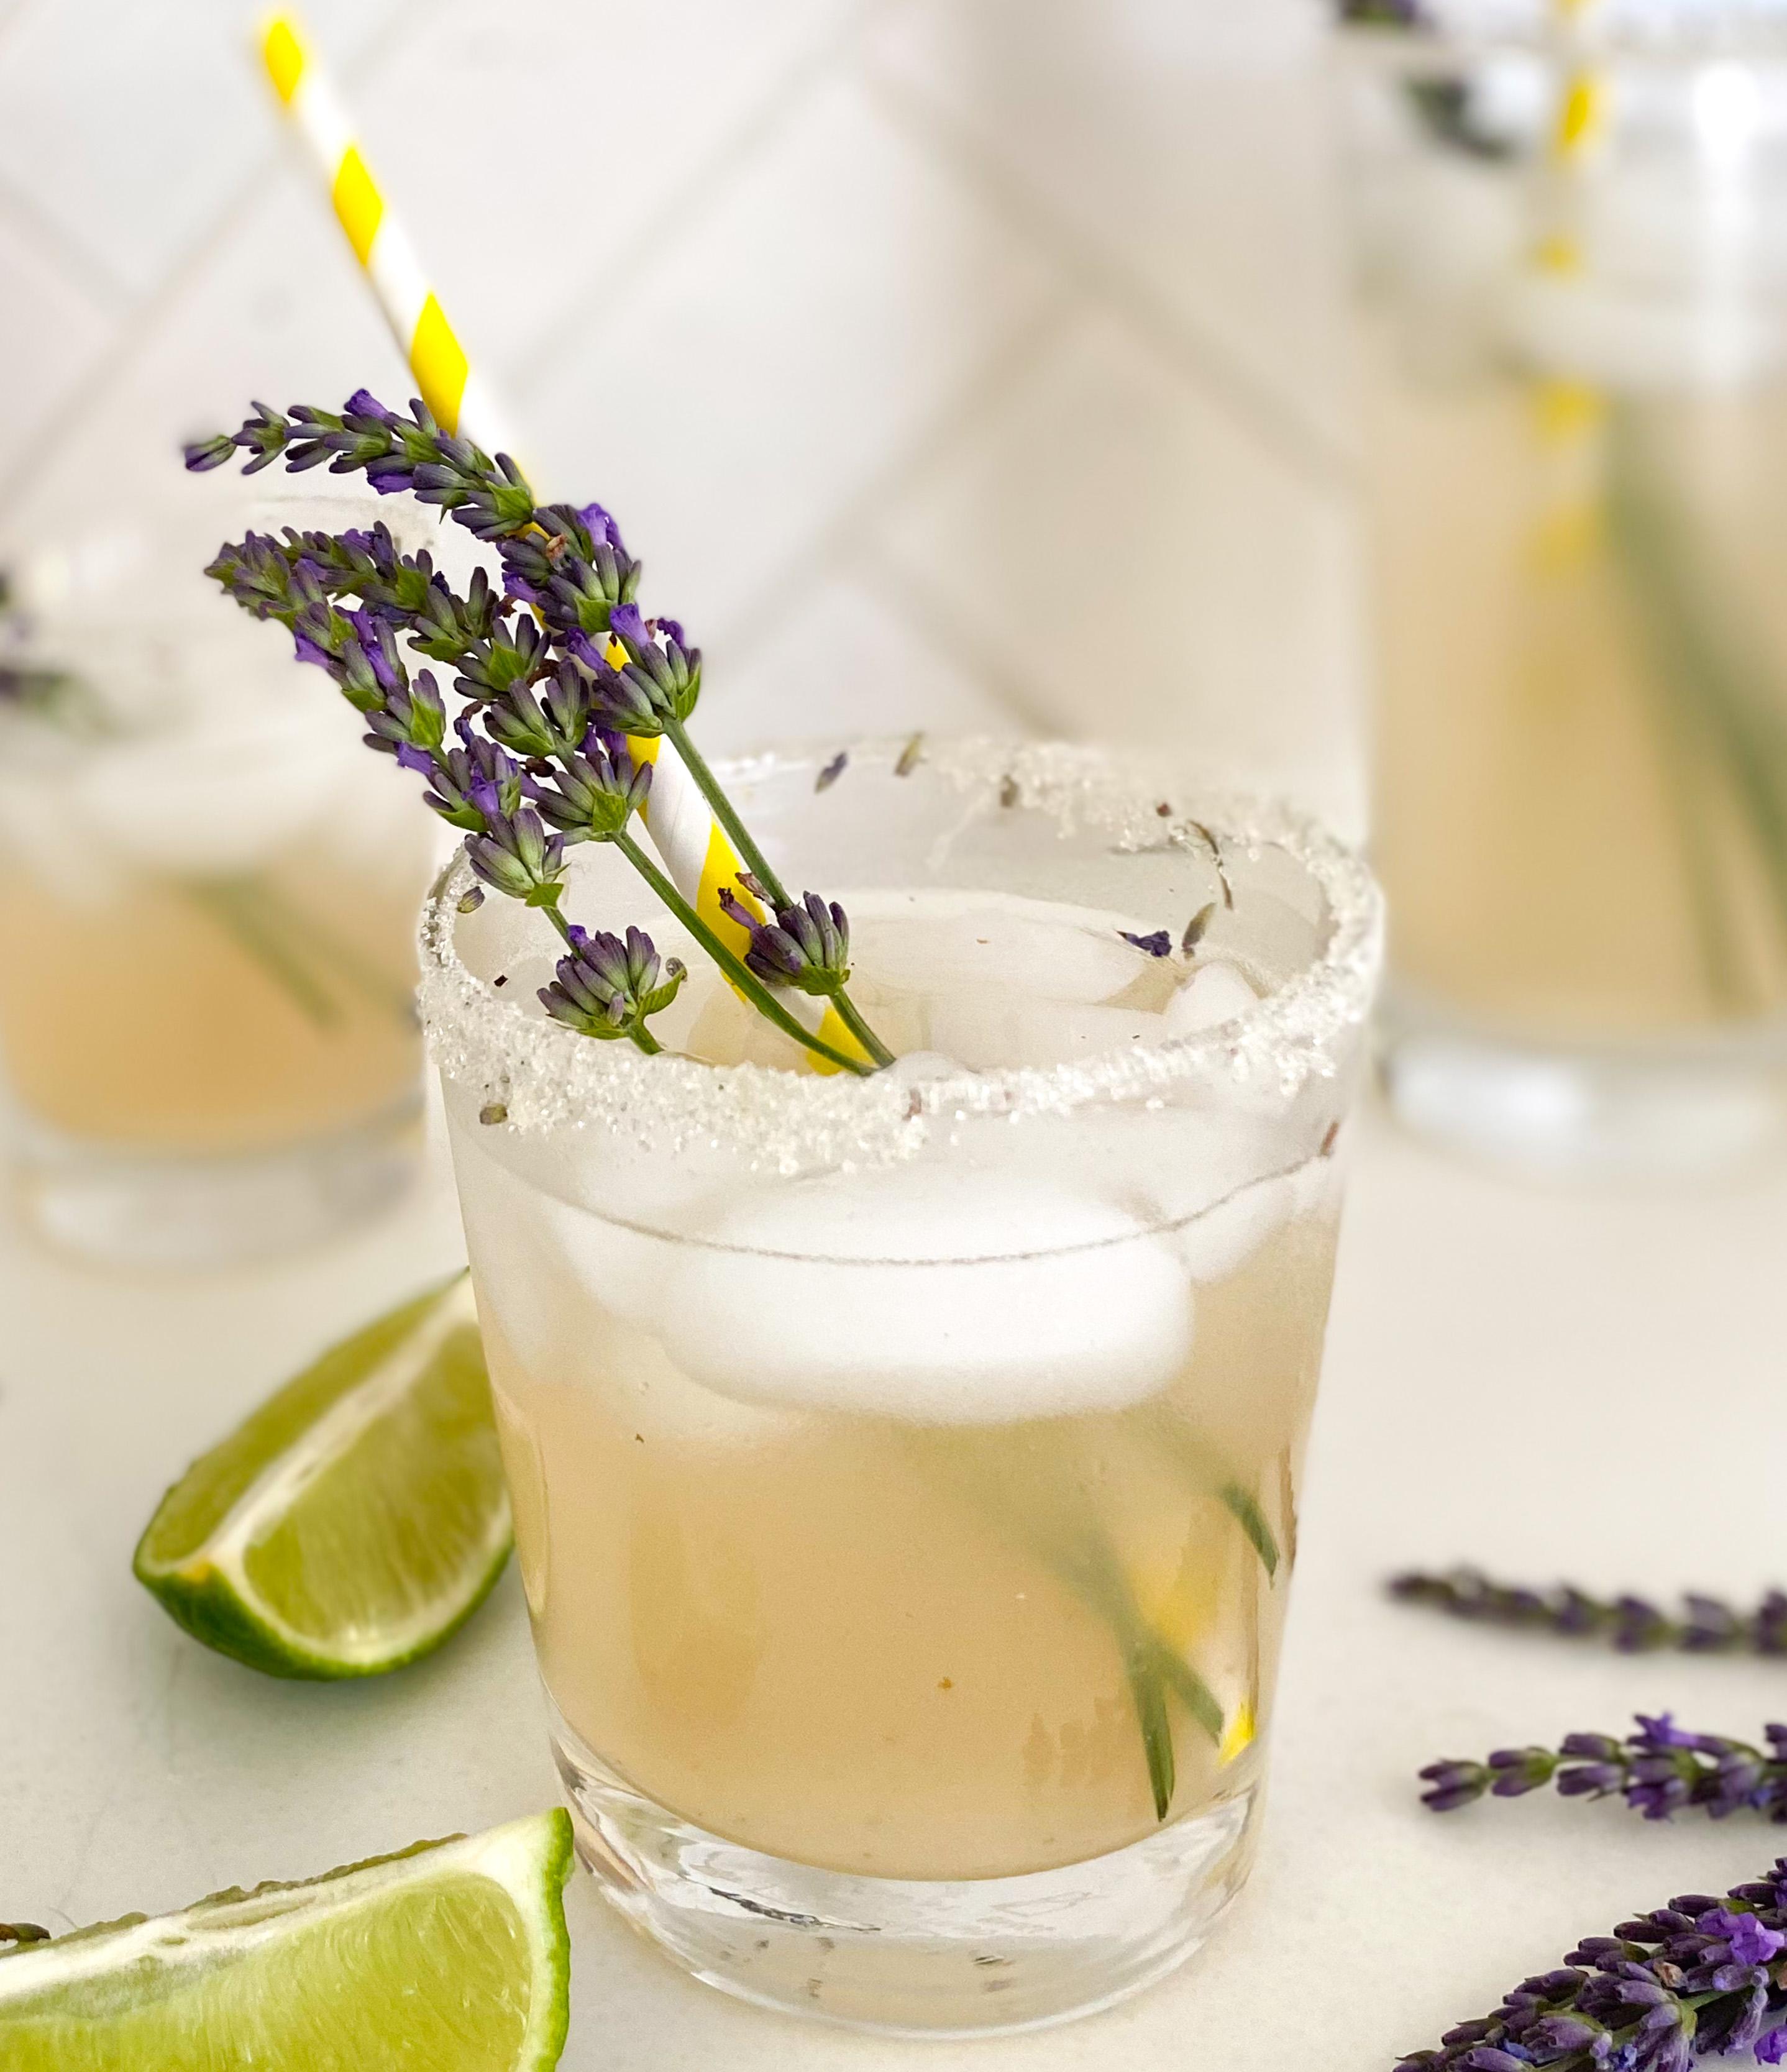 Backyard Vanilla Lavender Margarita